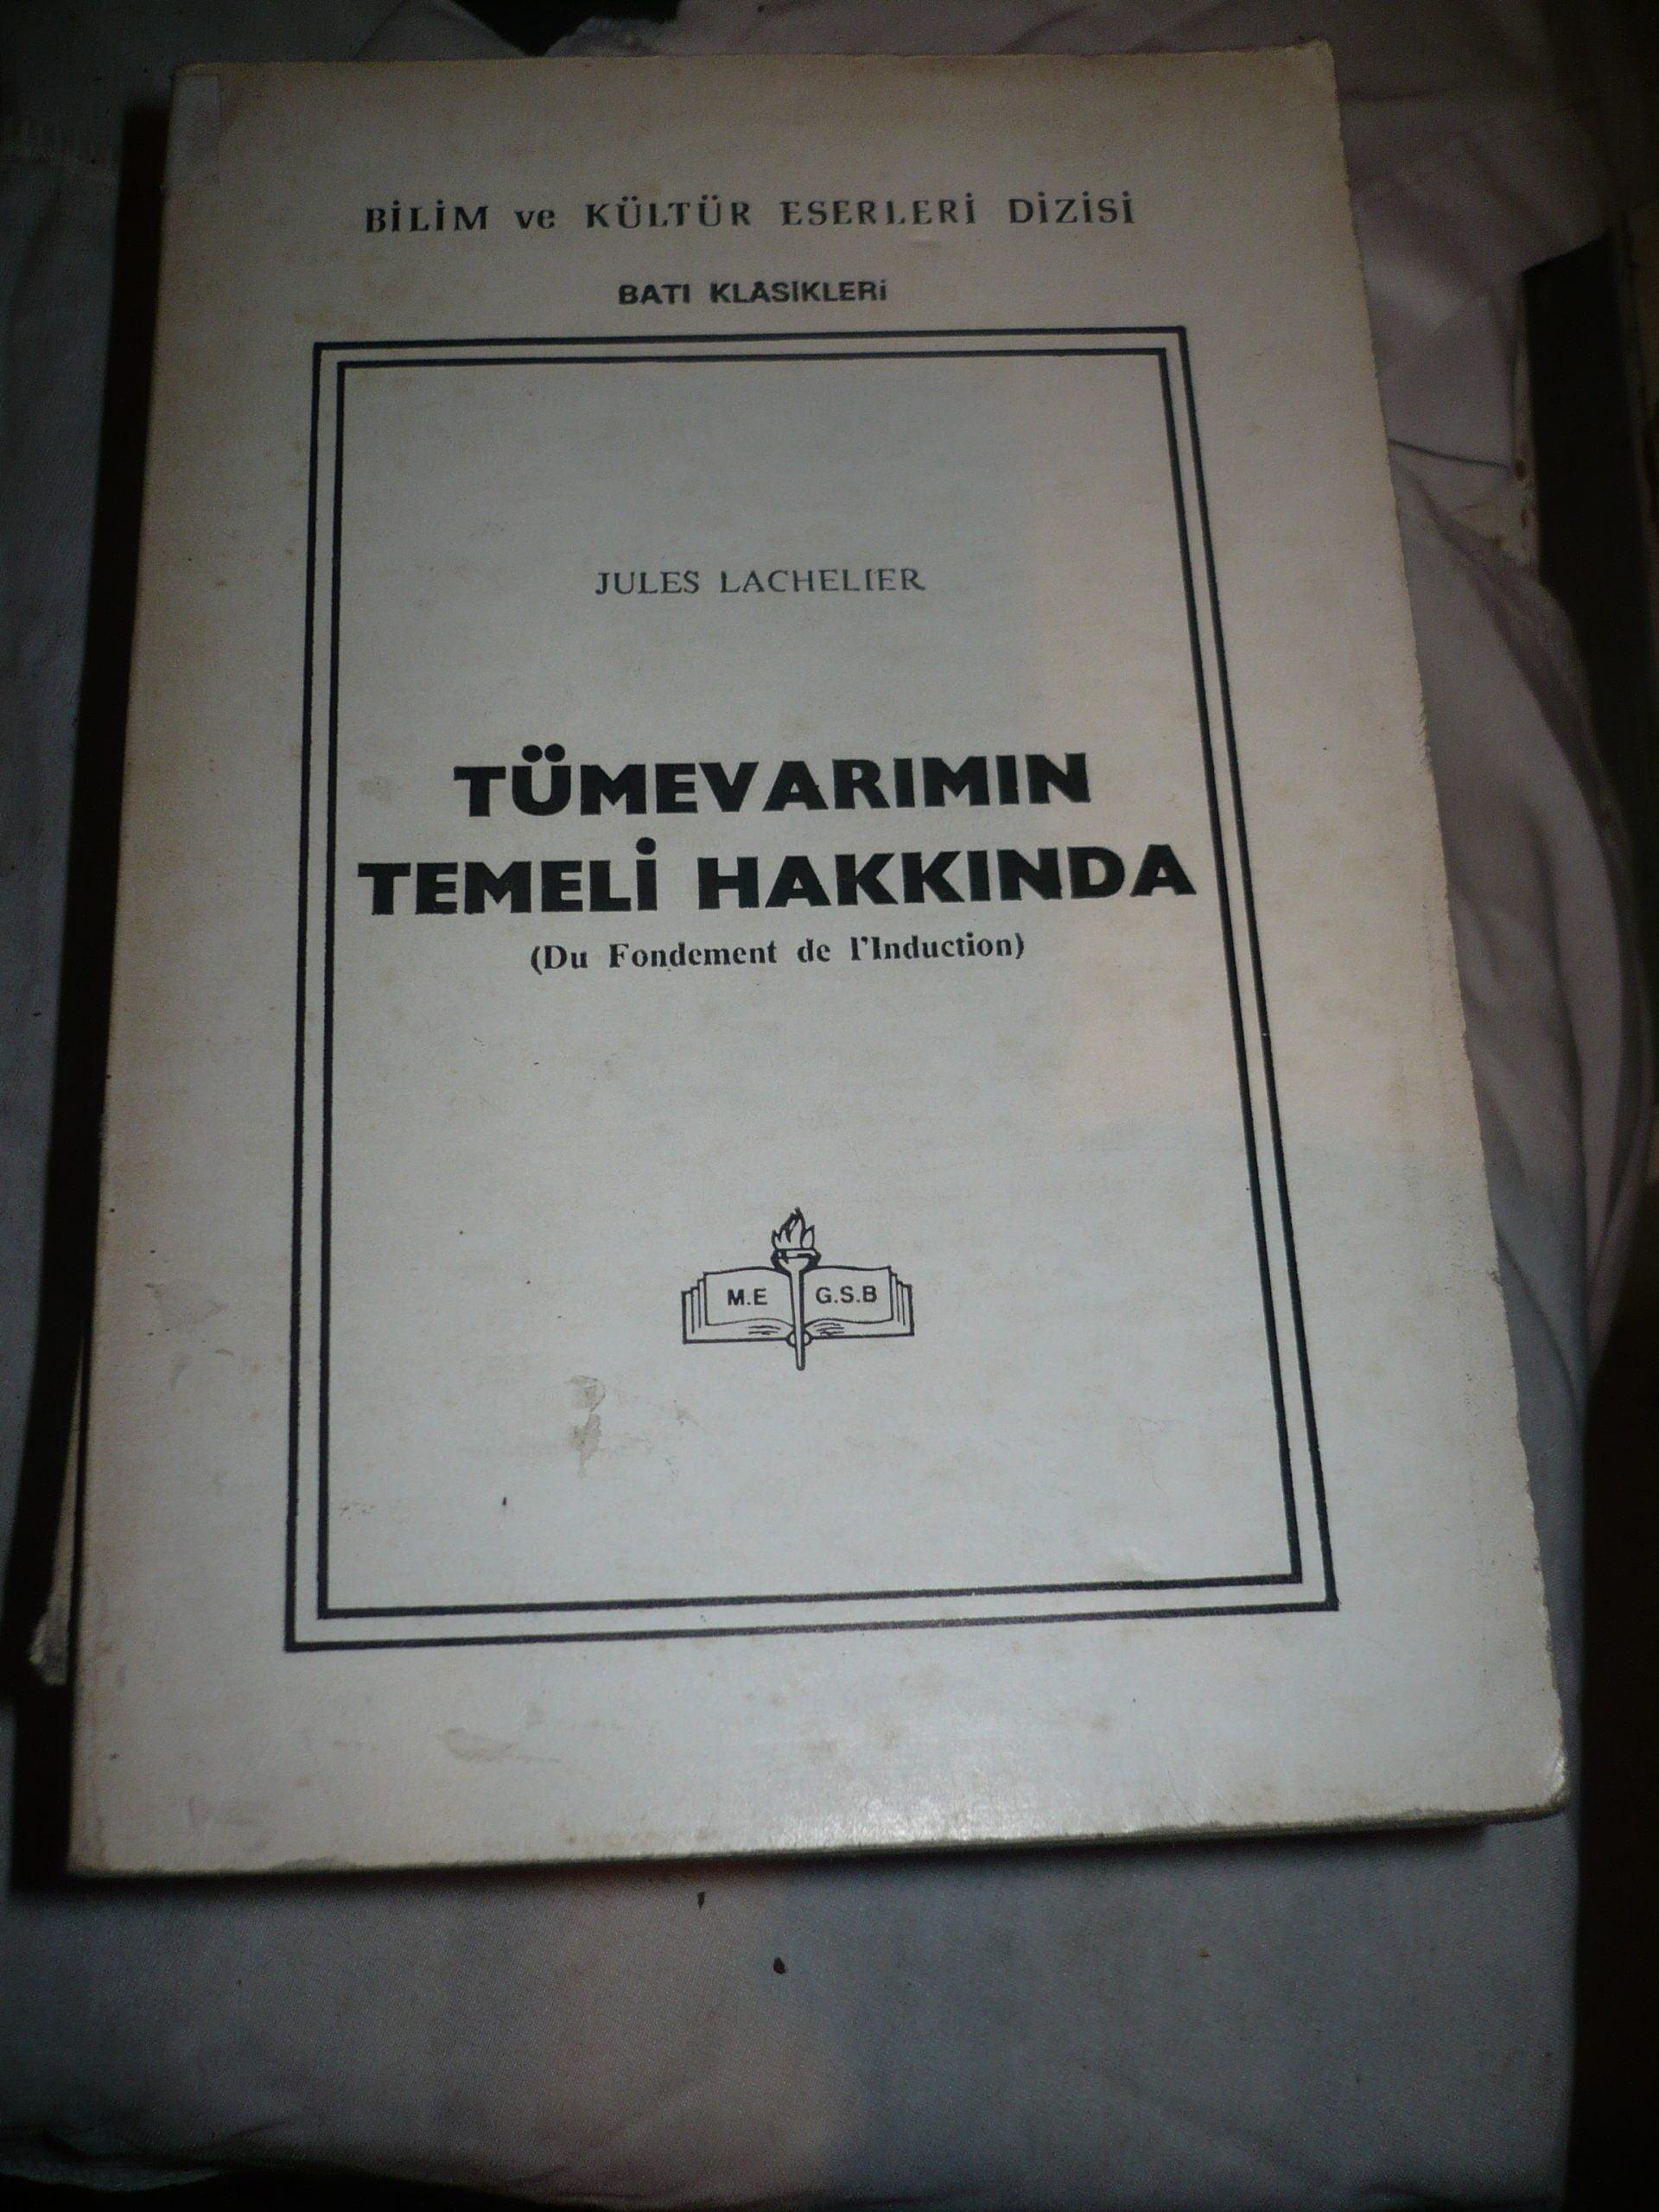 TÜMEVARIMIN TEMELİ HAKKINDA/JULES LACHELIER/15 TL